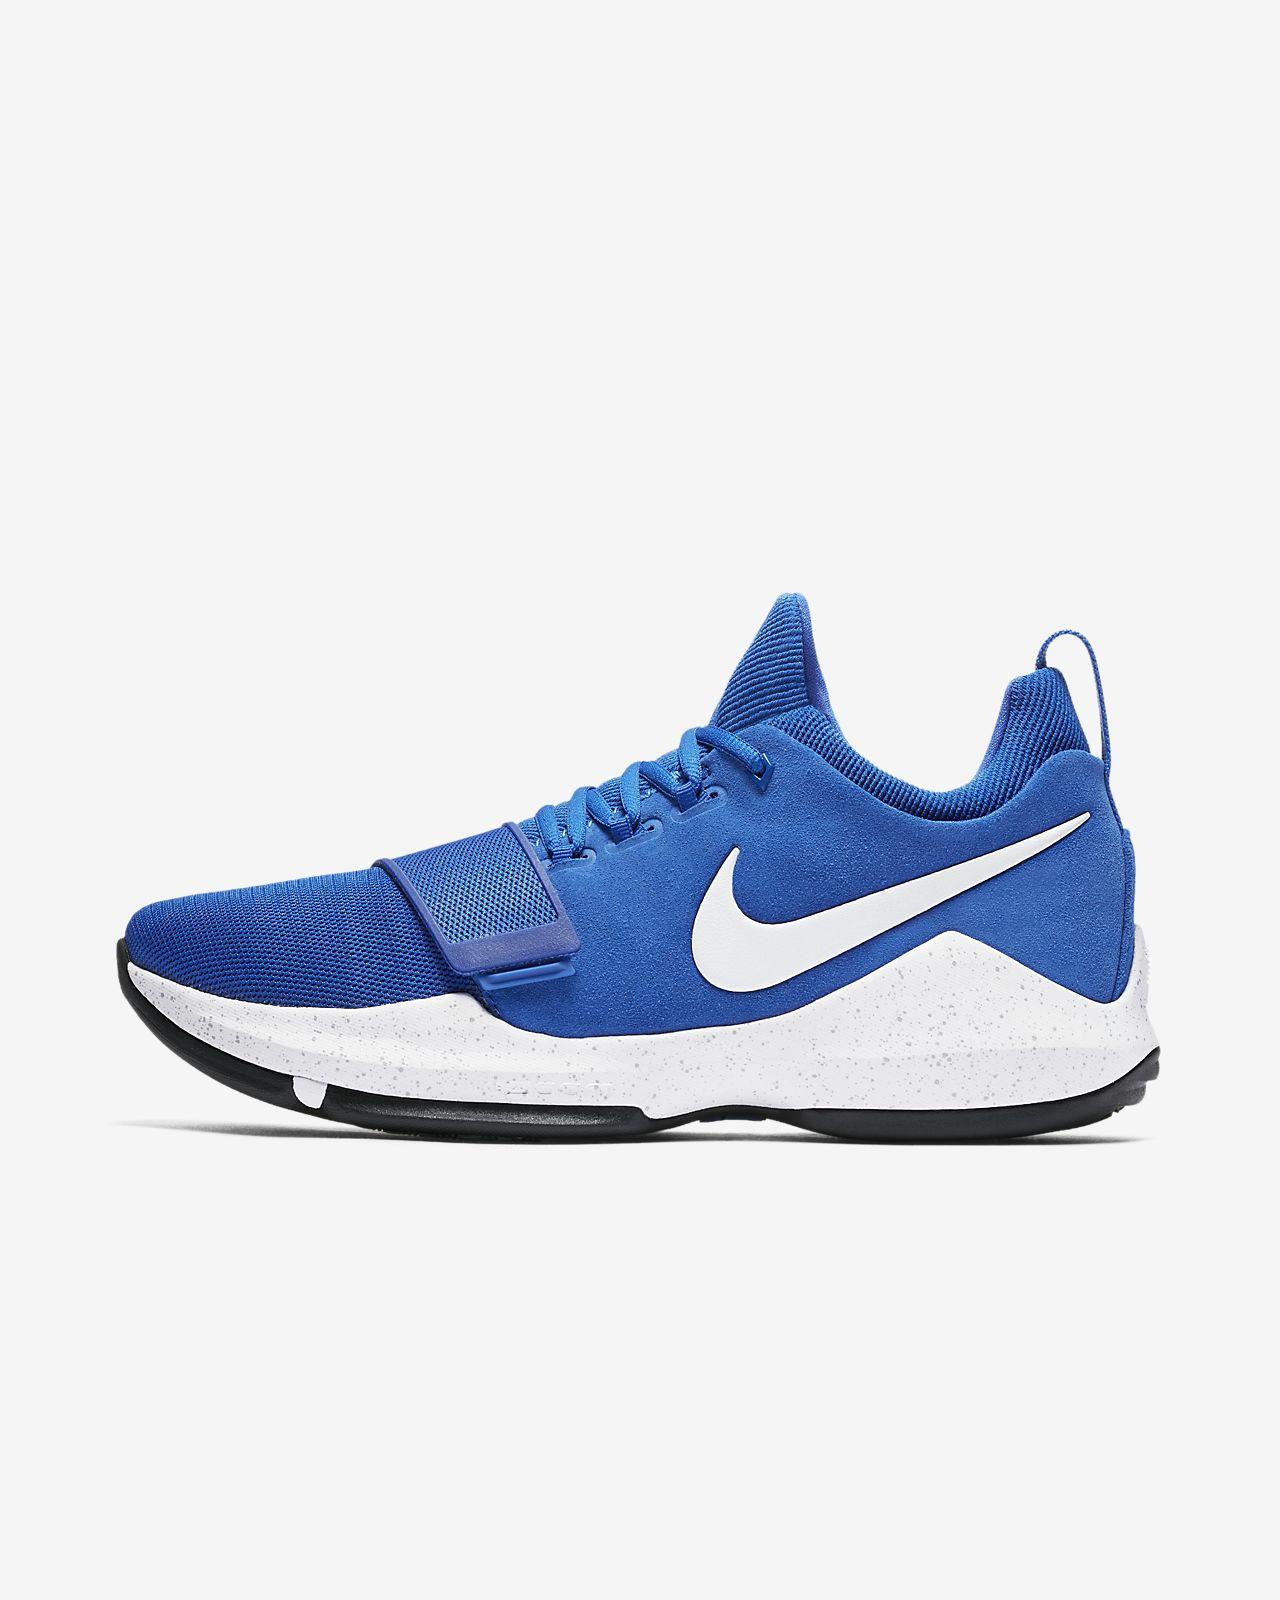 69e4c298b91e PG1 Basketball Shoe. Nike.com EG